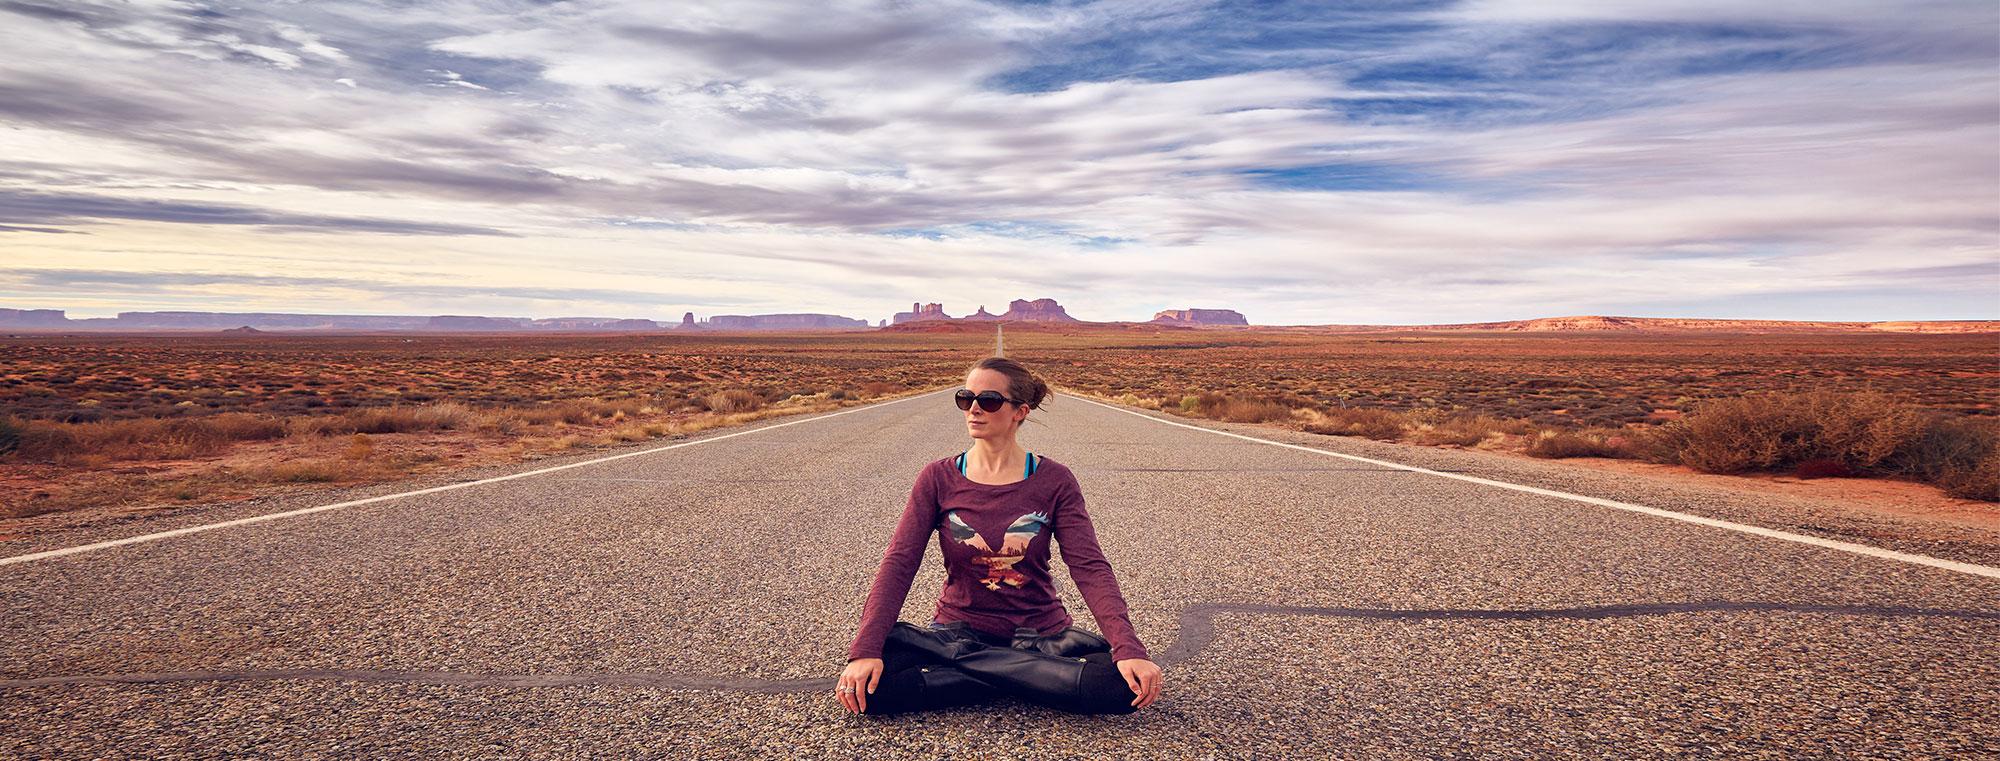 sida yoga monument valley homepage shot